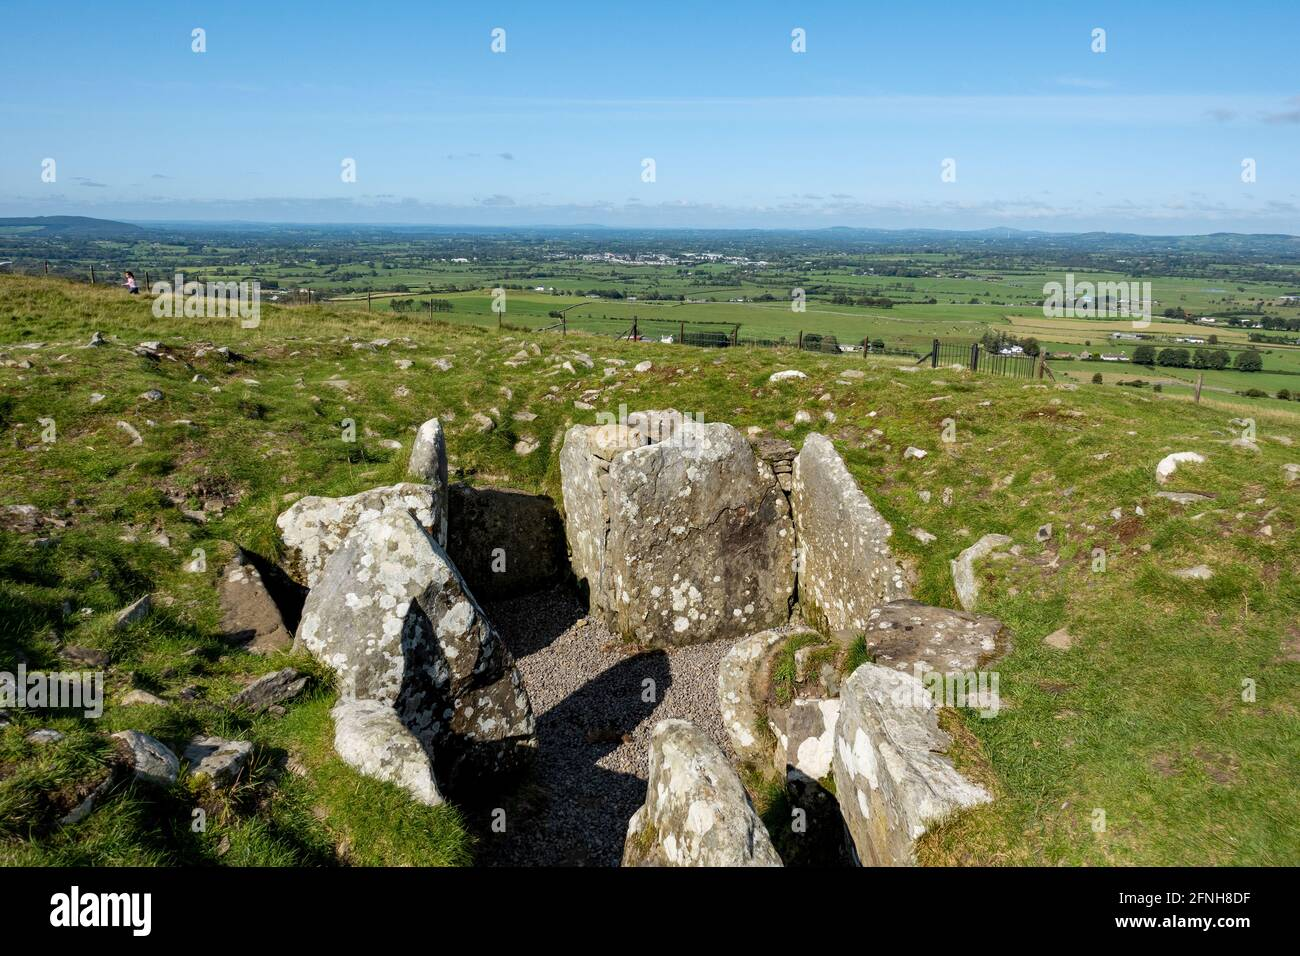 Loughcrews Ancient Passage Tombs, Co Meath, Ireland Stock Photo